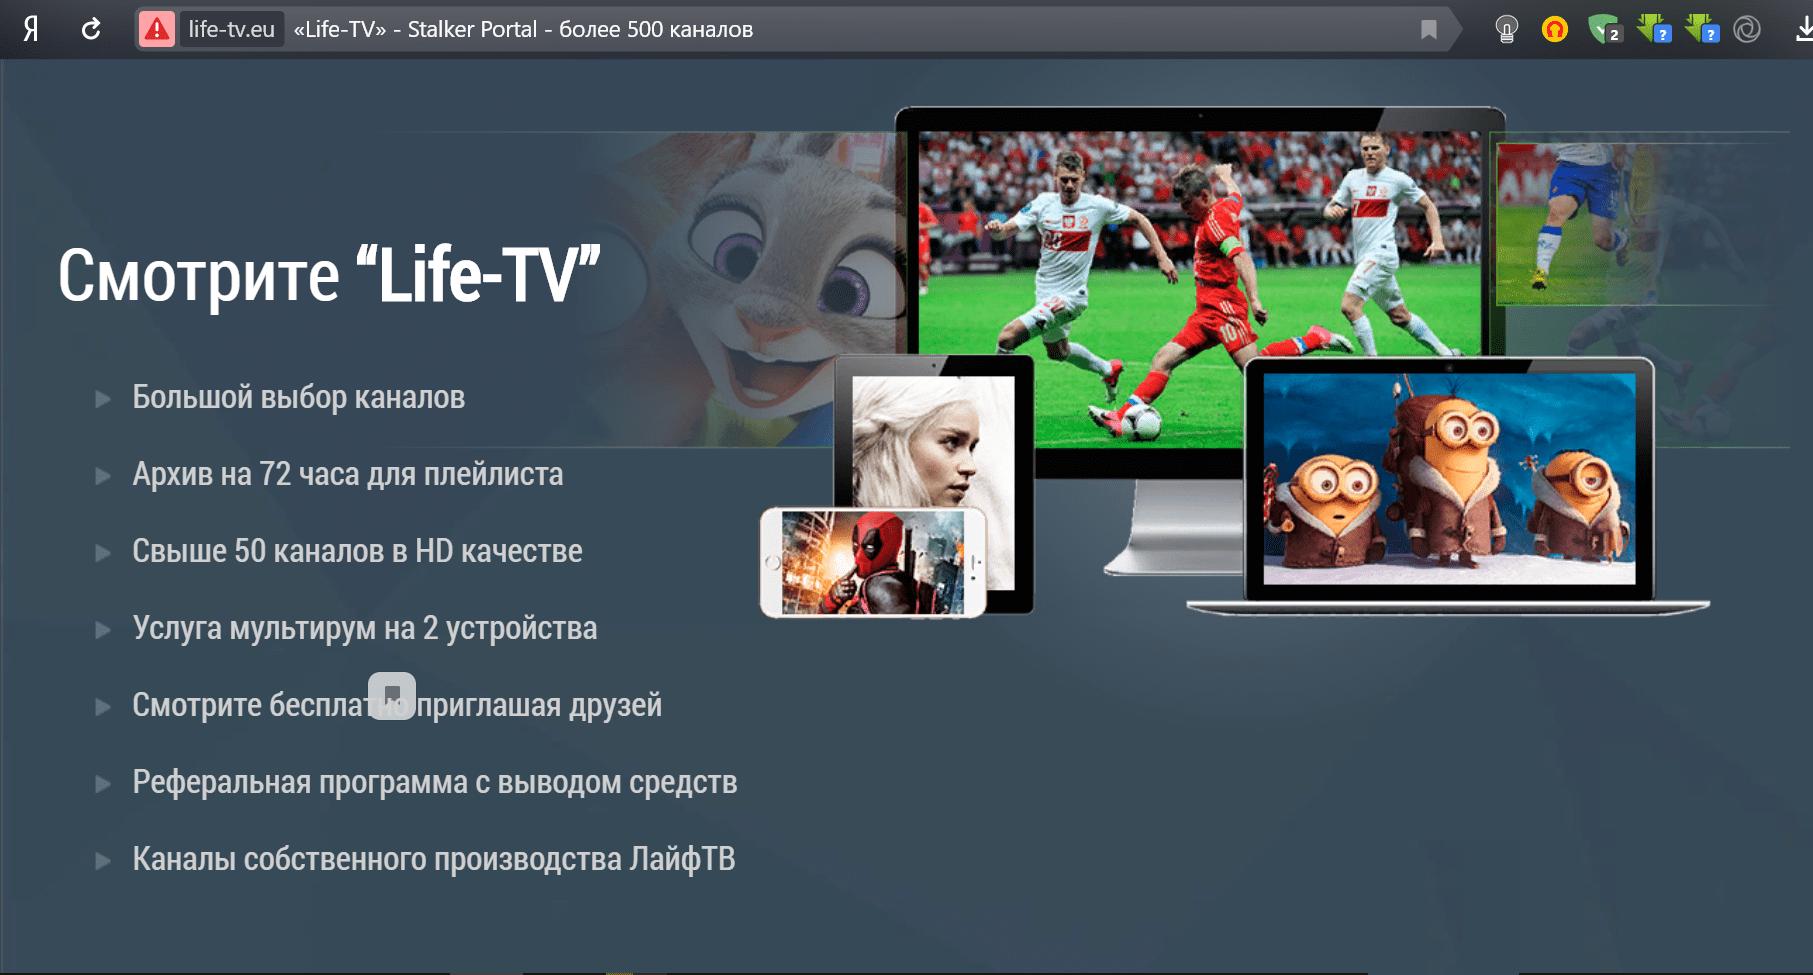 Life-TV